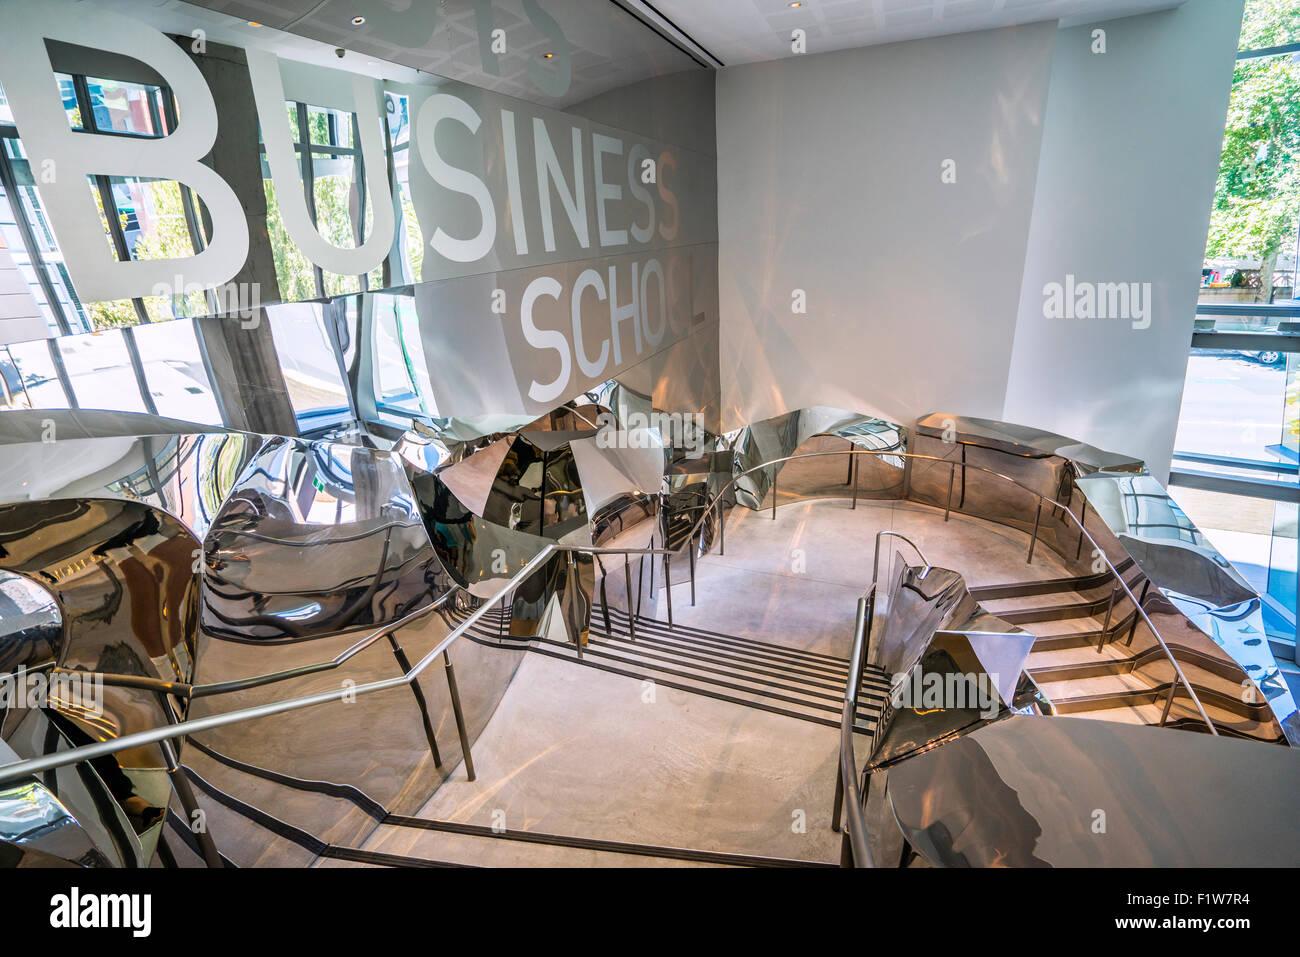 L'Australie, New South Wales, Sydney, University of Technology Sydney, UTS, escaliers sont en acier inoxydable Photo Stock